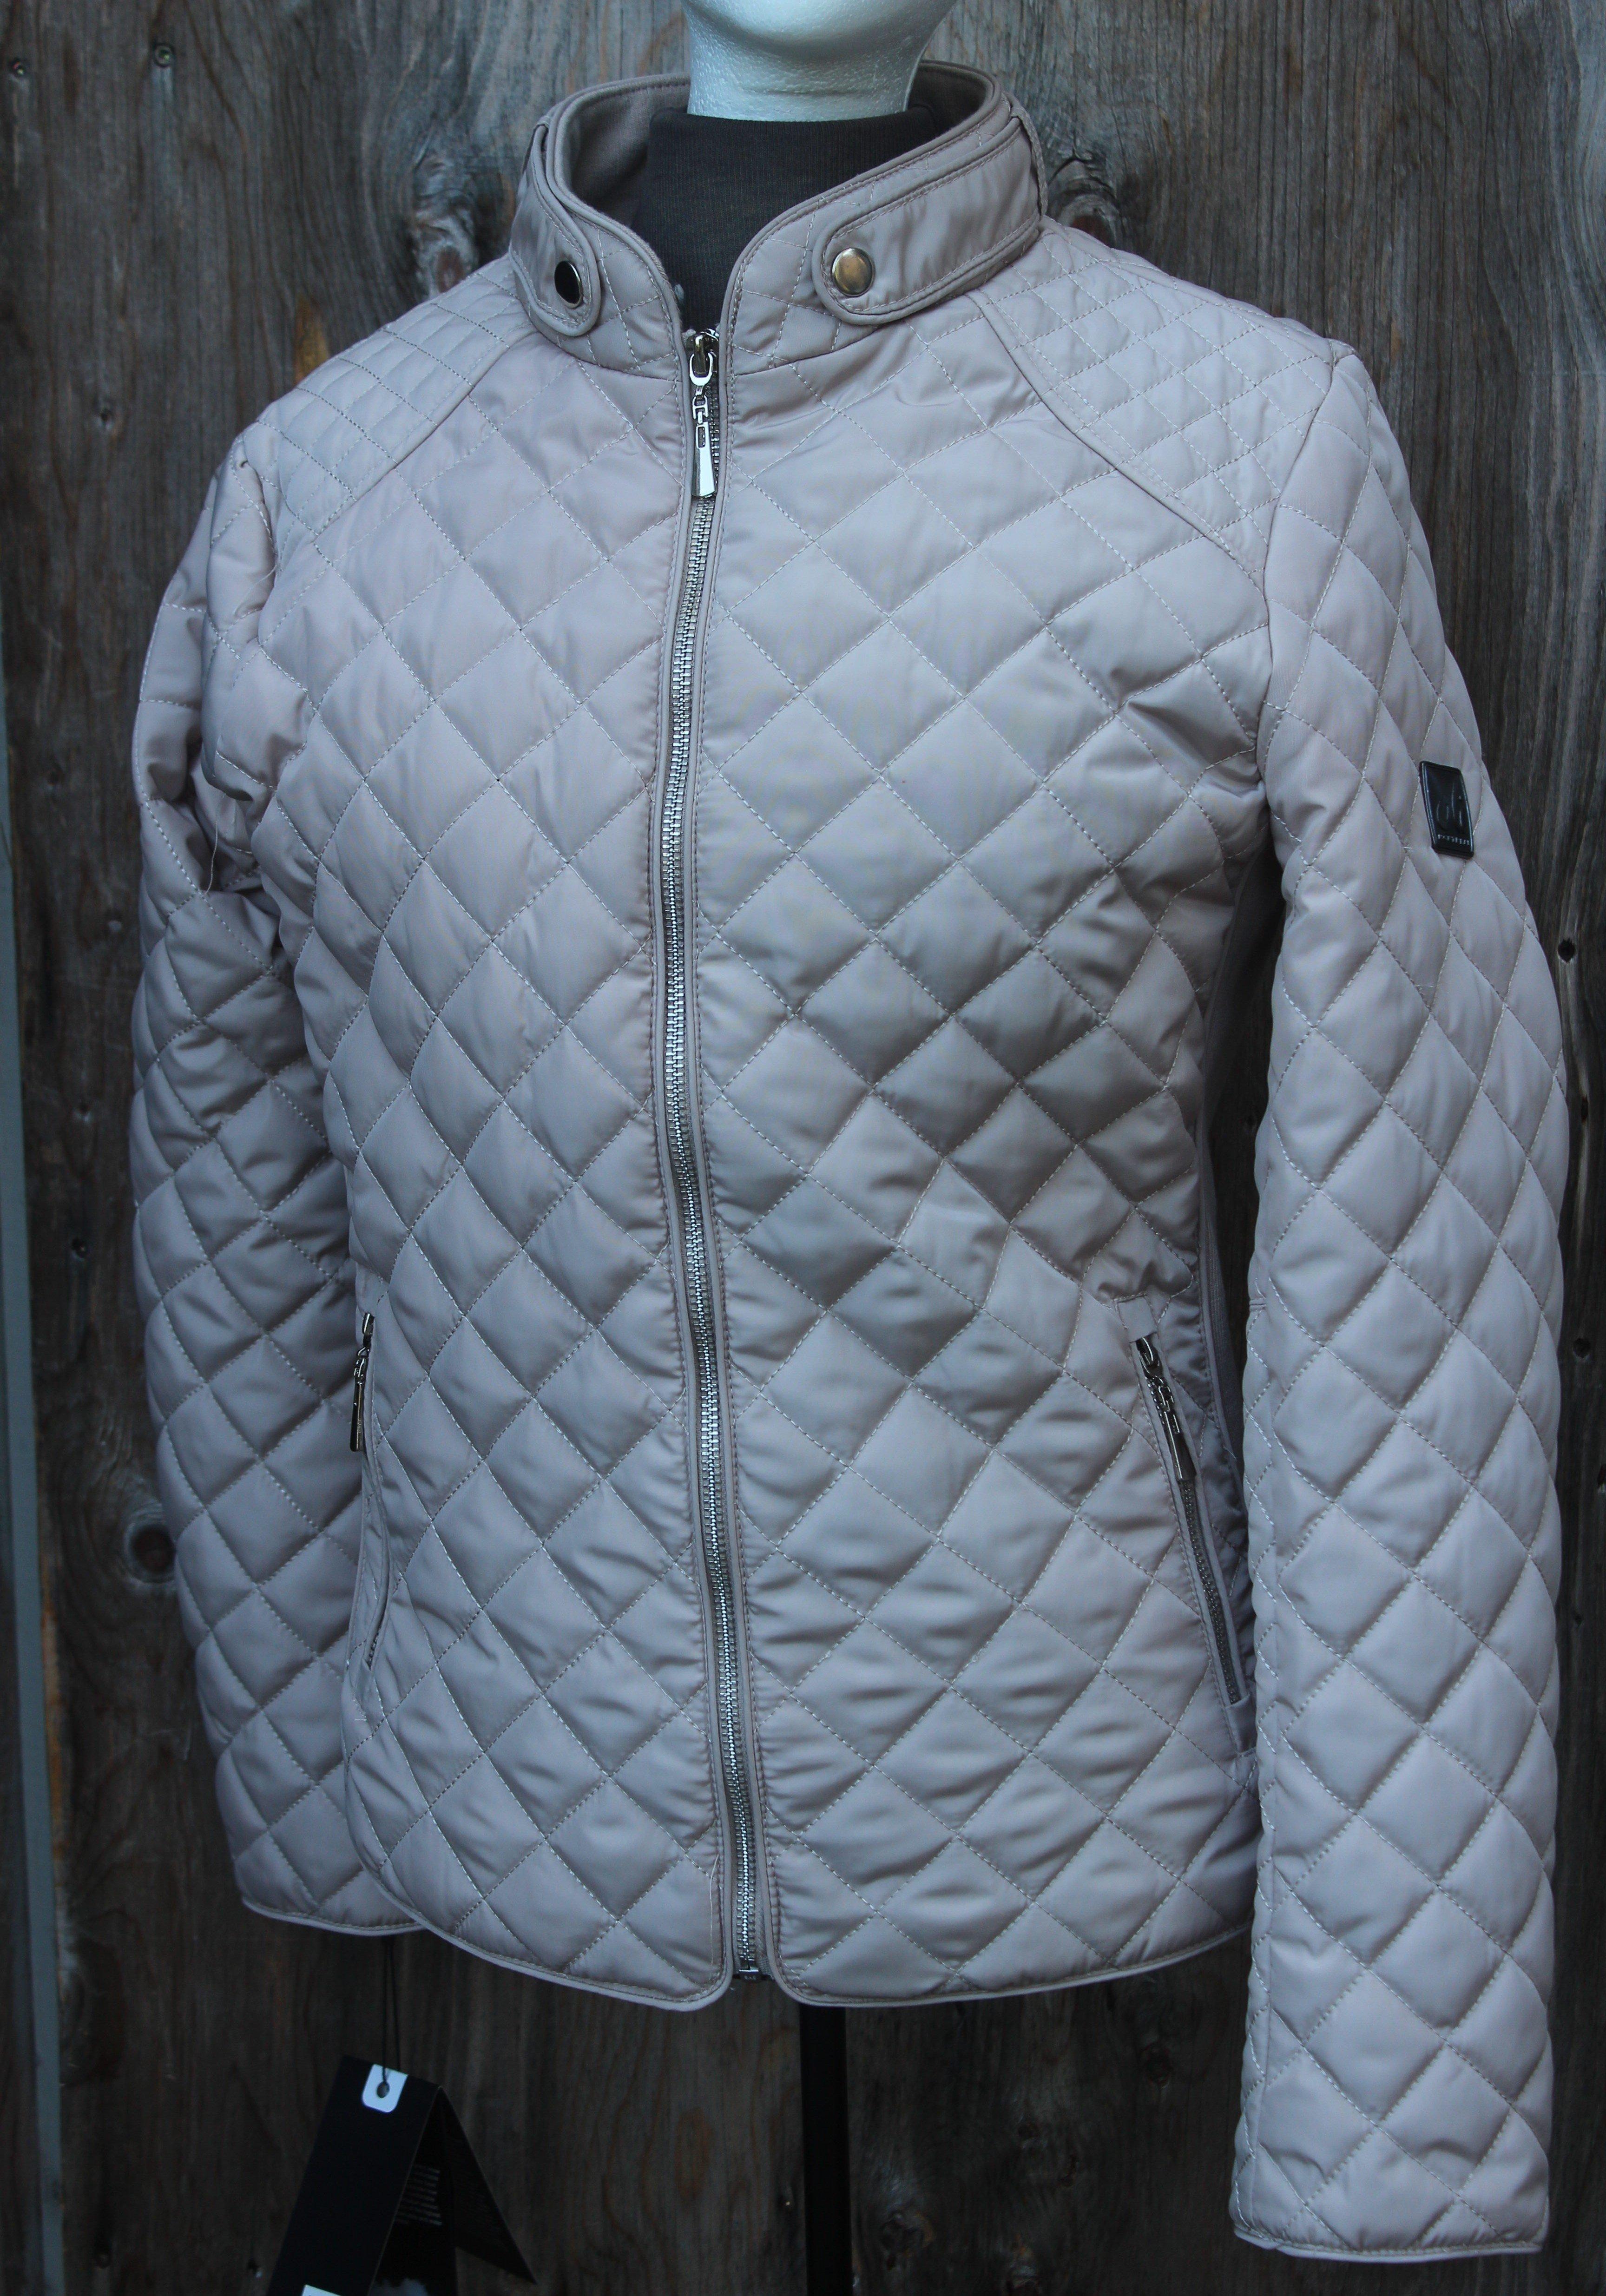 Off White- $95.00 Plonge: Style #70505W